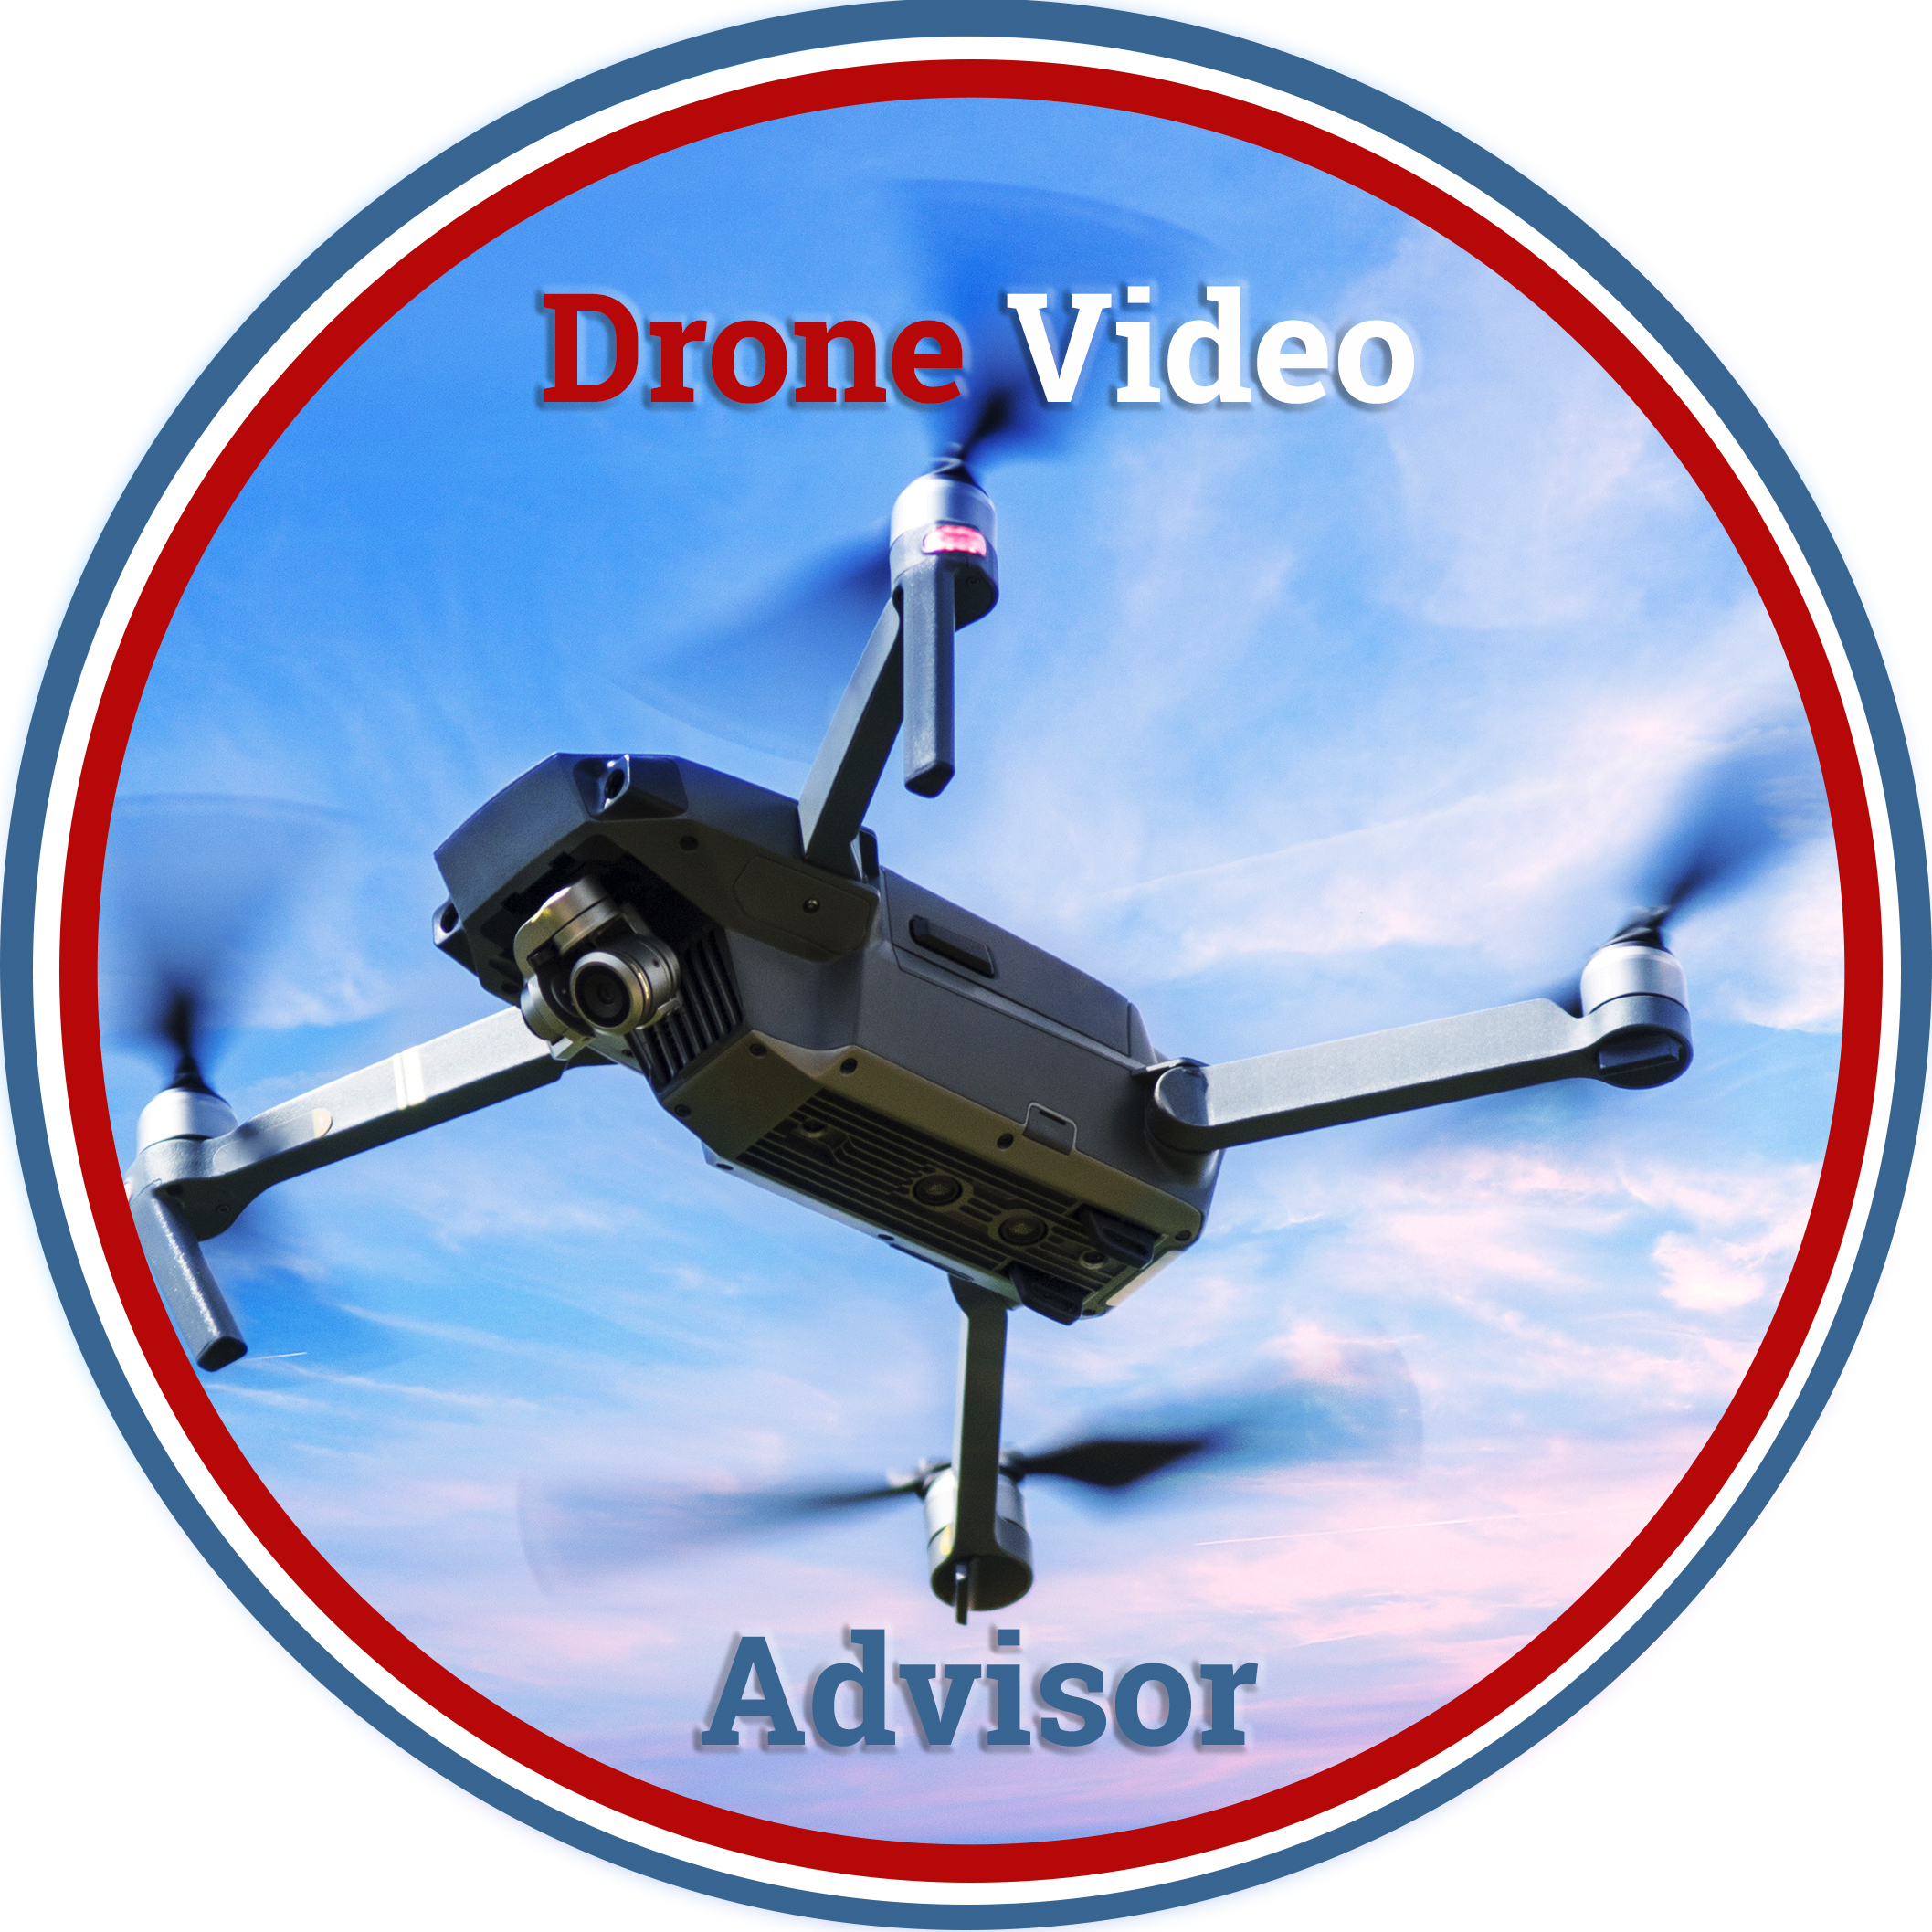 Drone Video Advisor